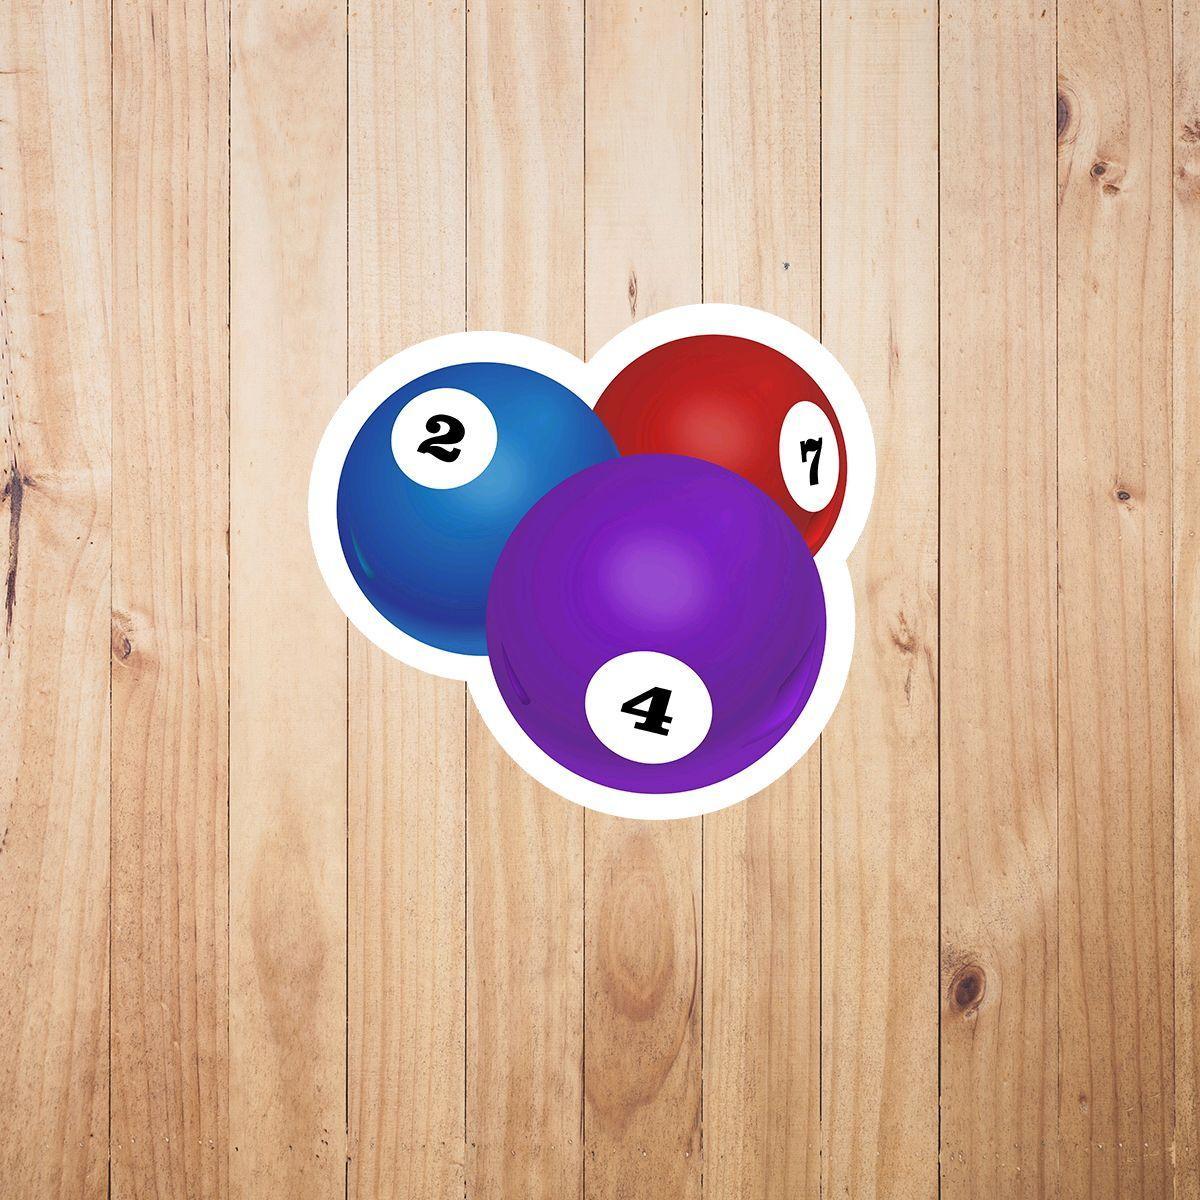 Aplique adesivo tag - bolas sinuca bilhar no Elo7  8818eaa38356b